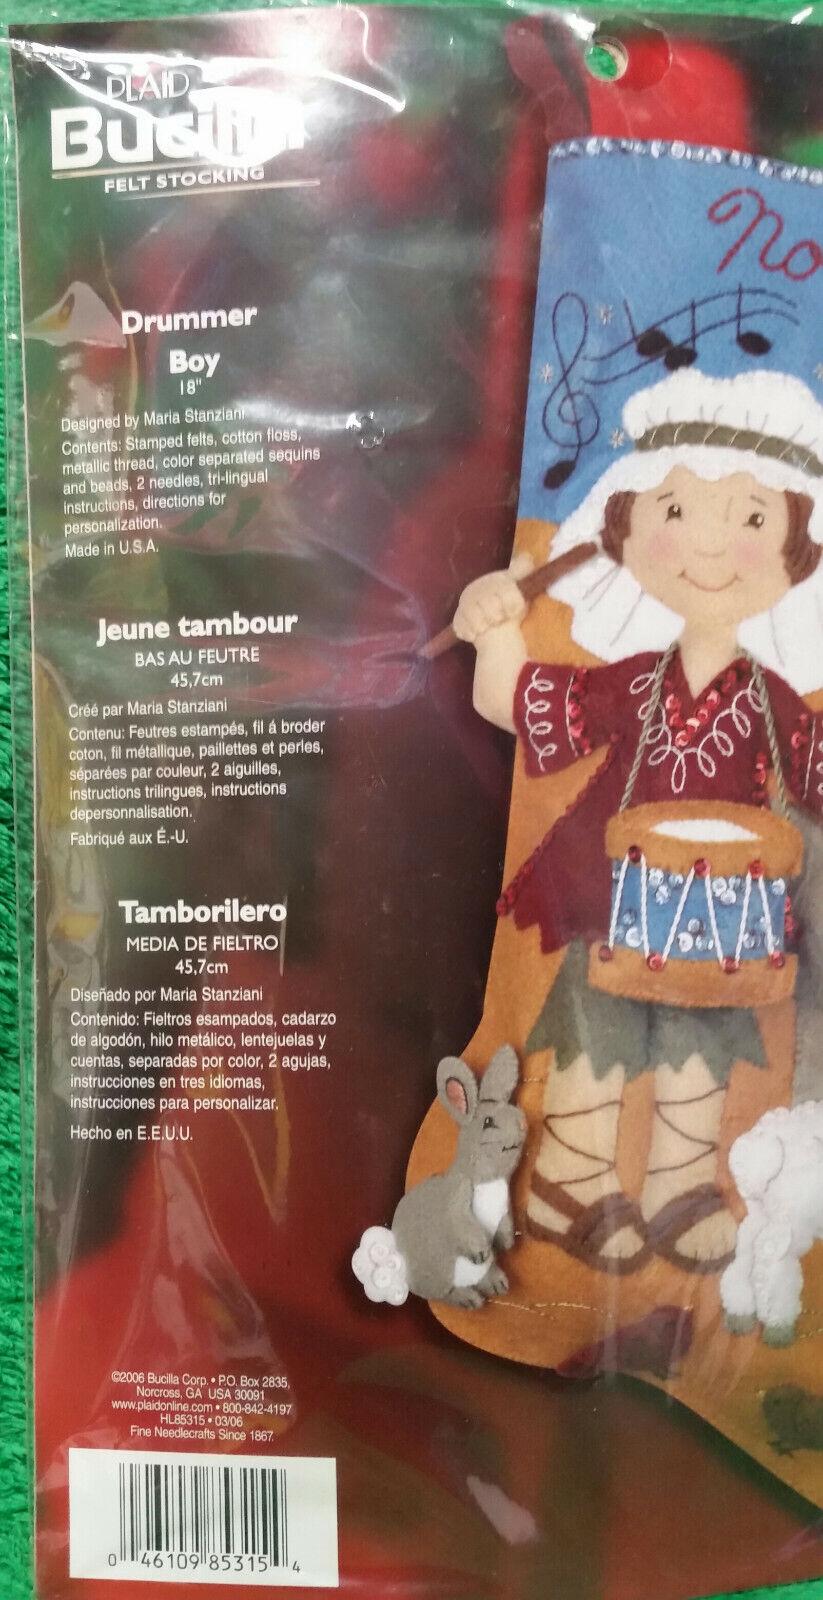 NEW sealed Bucilla Drummer Boy ornament kit set of 6 from 2006 kit # 85338